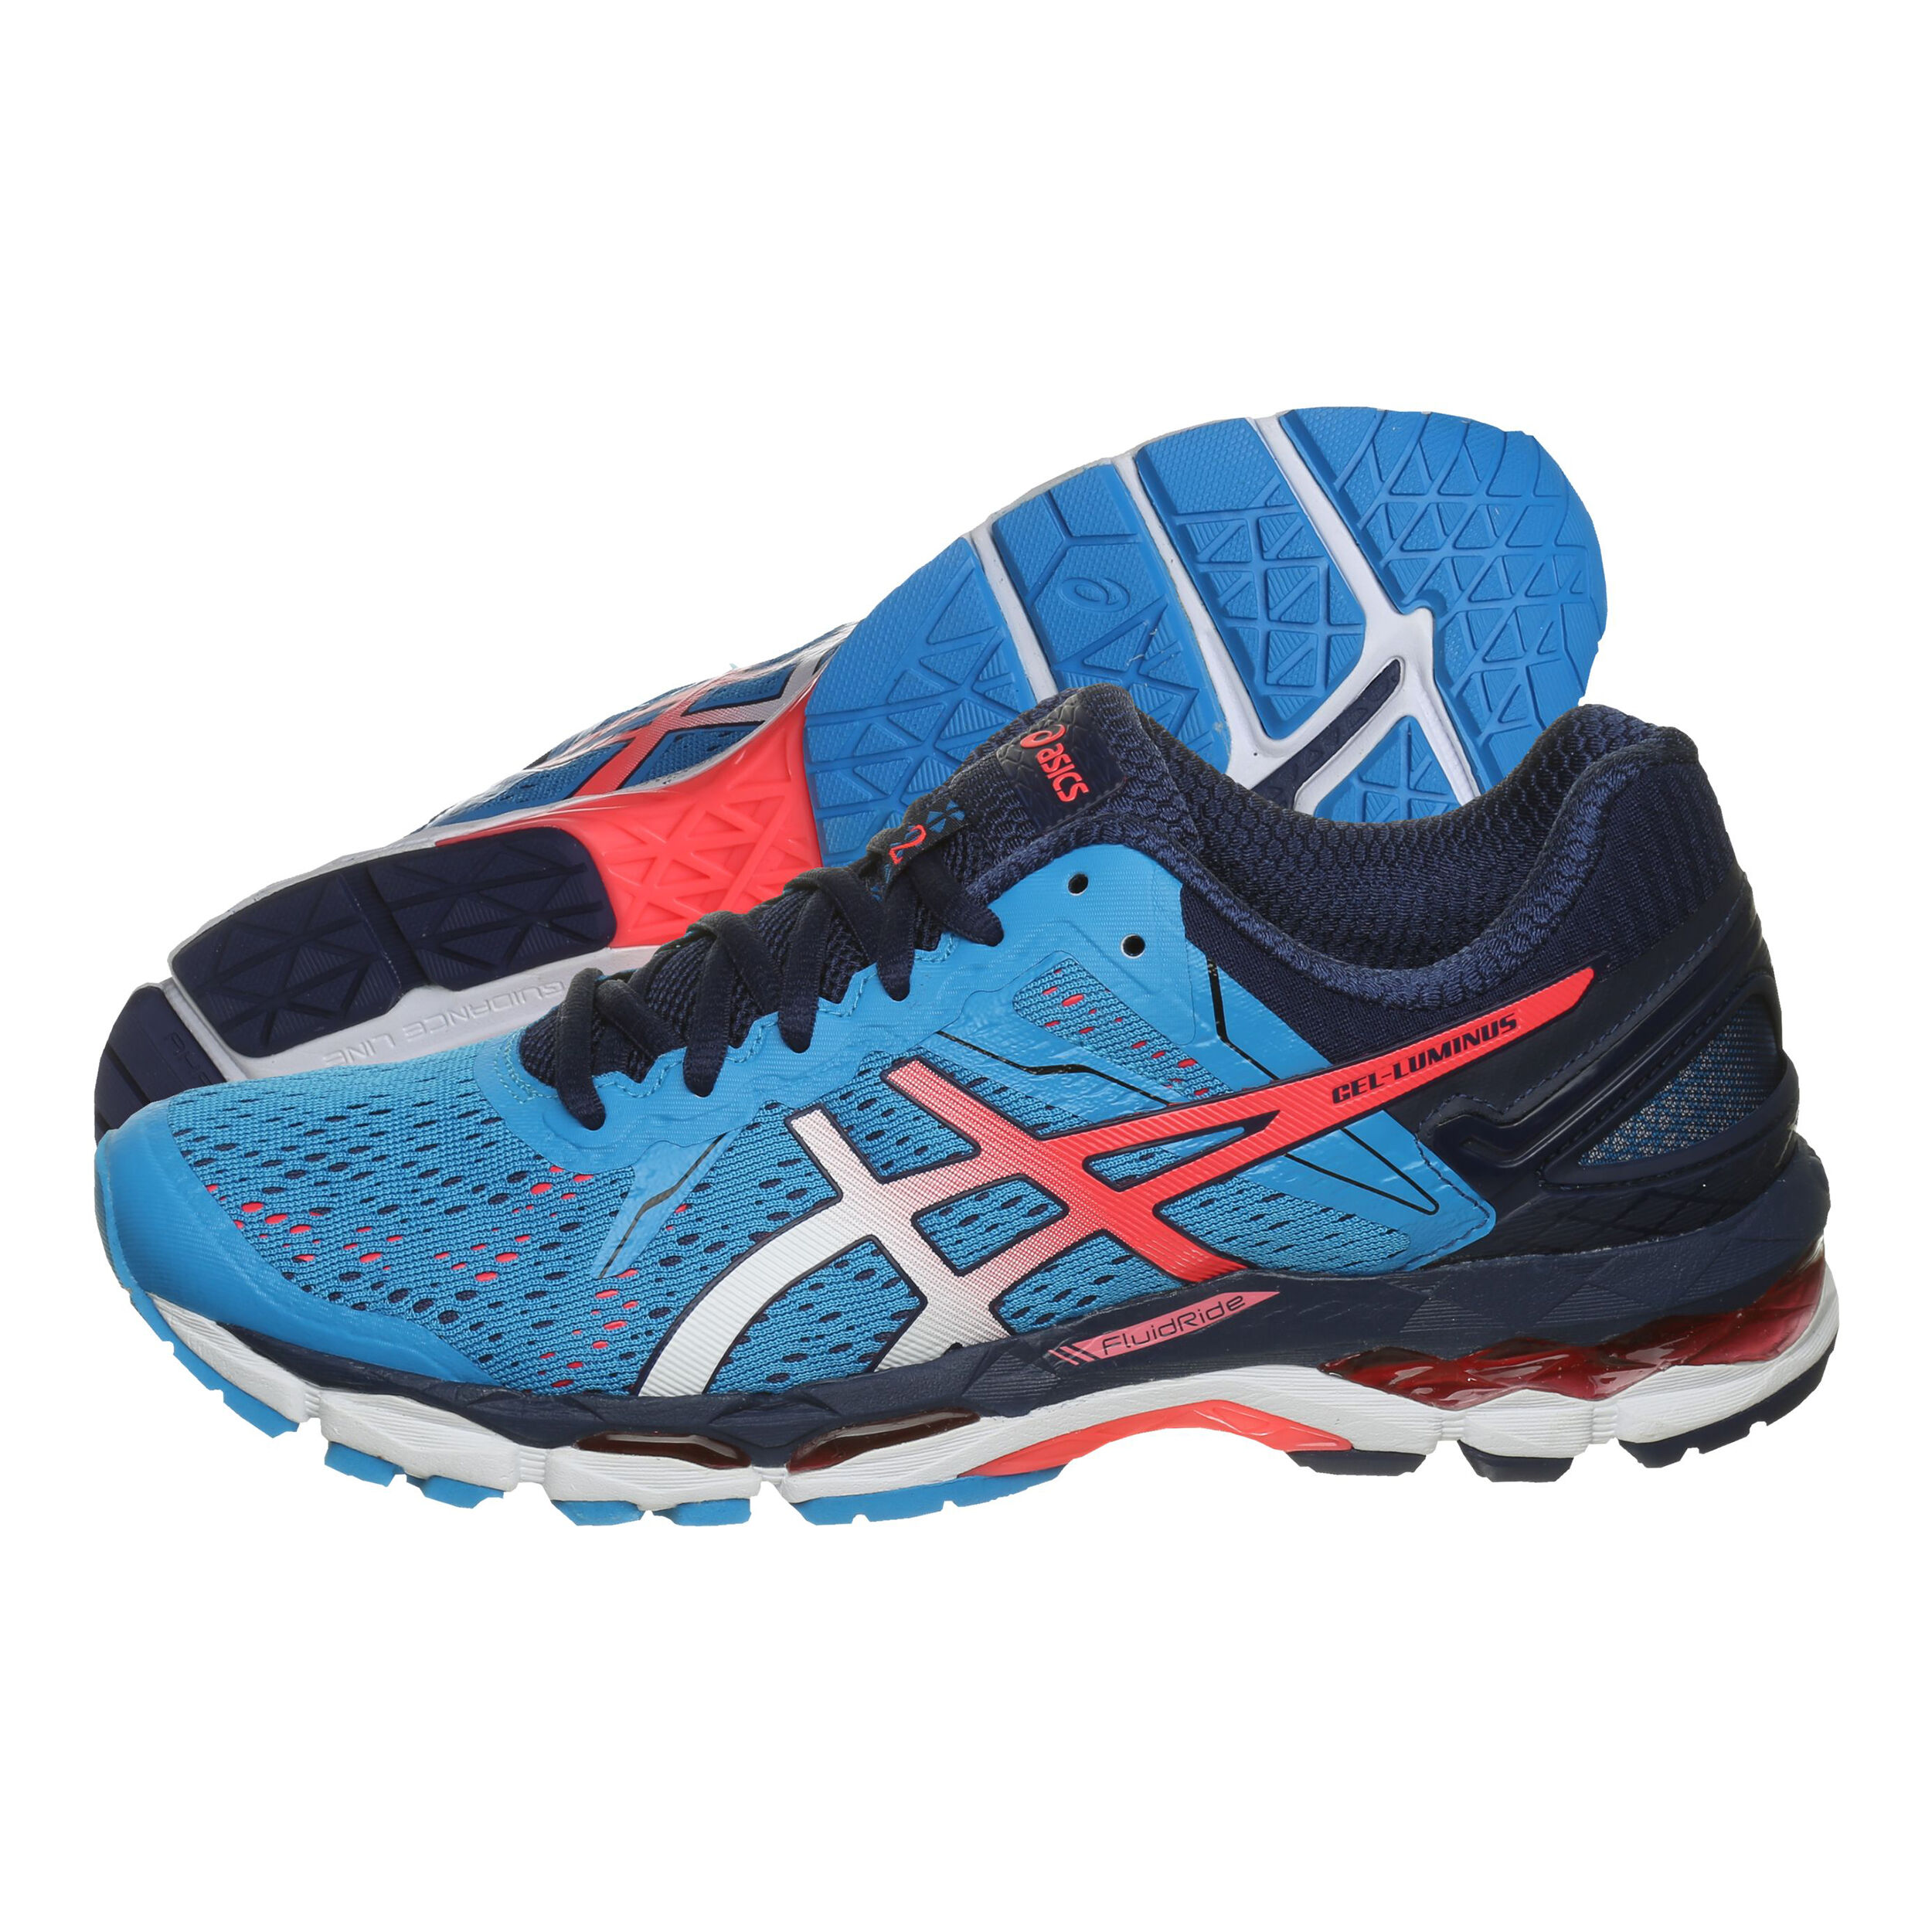 buy Asics Gel Luminus 2 Stability Running Shoe Women Blue